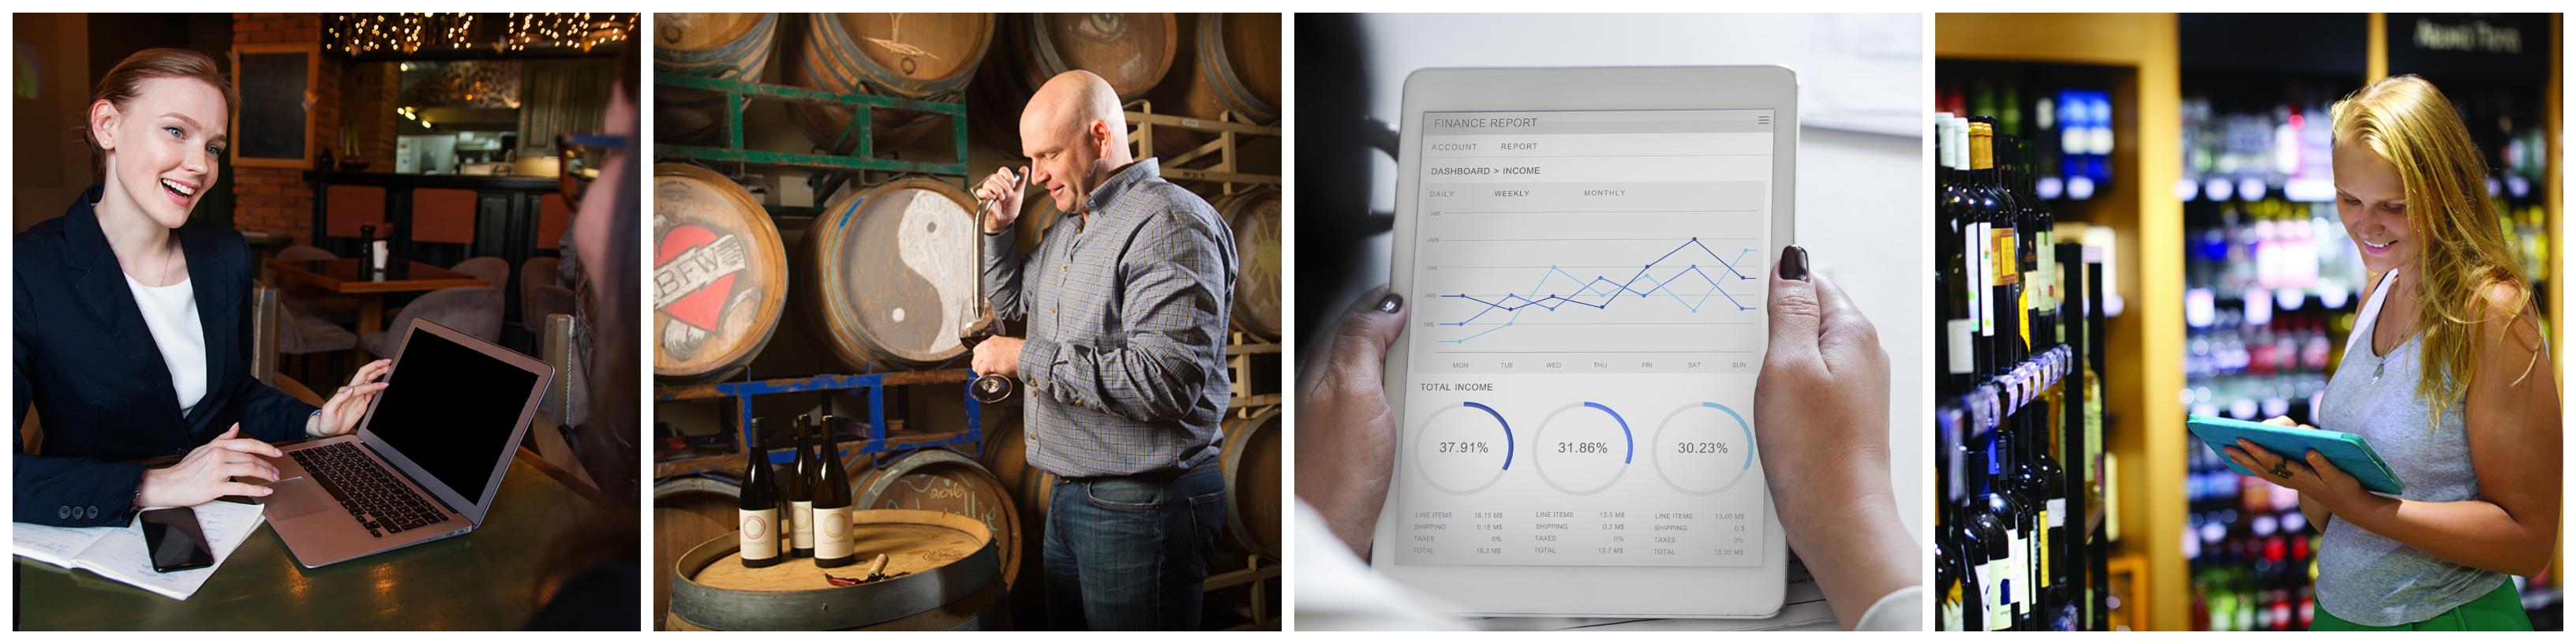 Wine Business Management